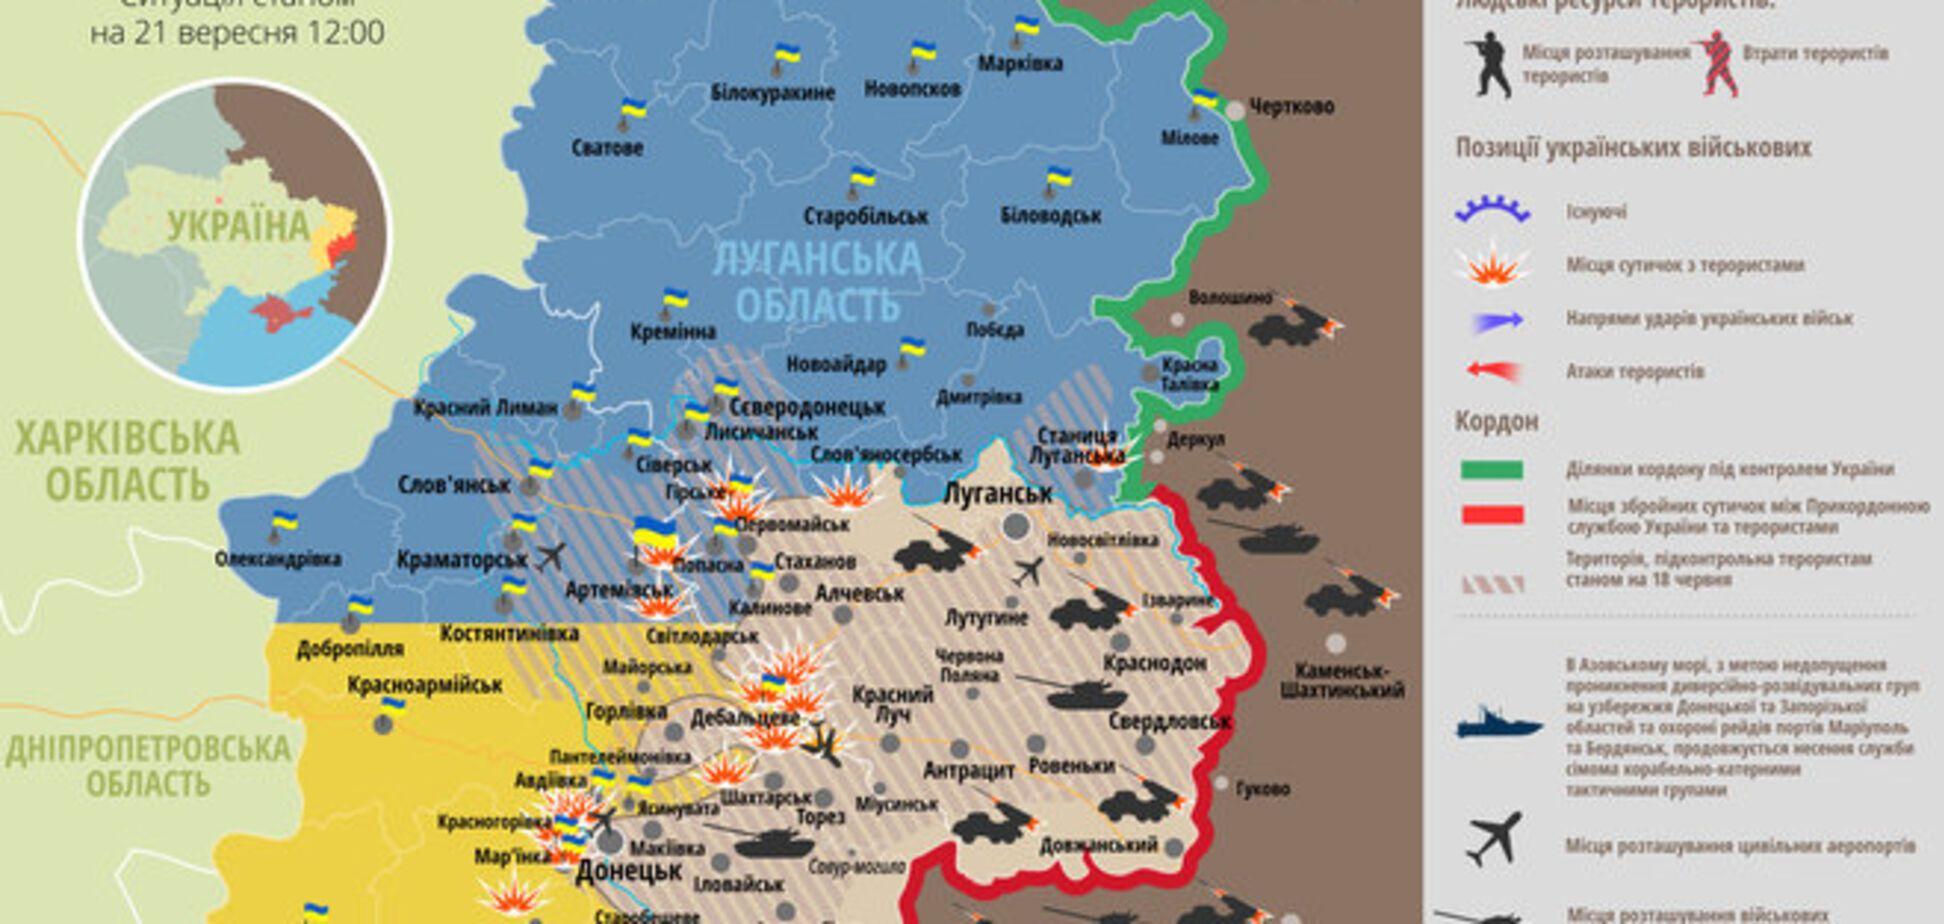 Опубликована карта действий в зоне АТО за 21 сентября